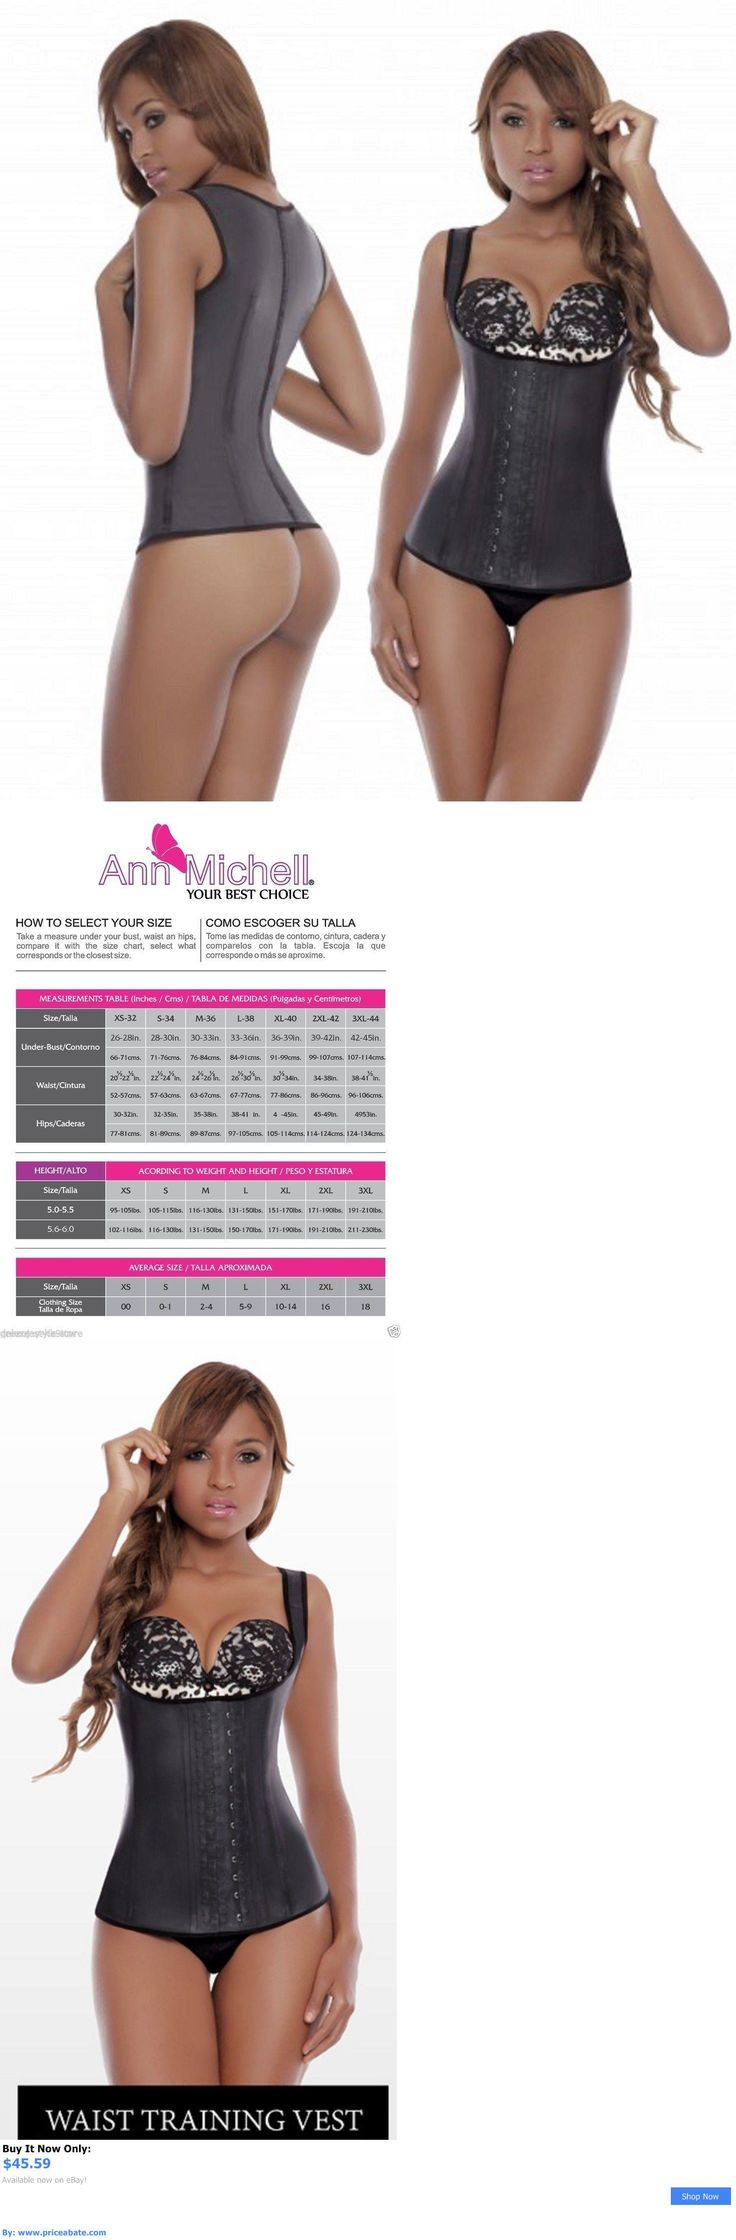 The colombian women s cycling team idrd bogota humana san mateo - Women Shapewear Full Vest Latex Ann Michell 2027 Classic Waist Trainer Colombian Womens Shaper Buy